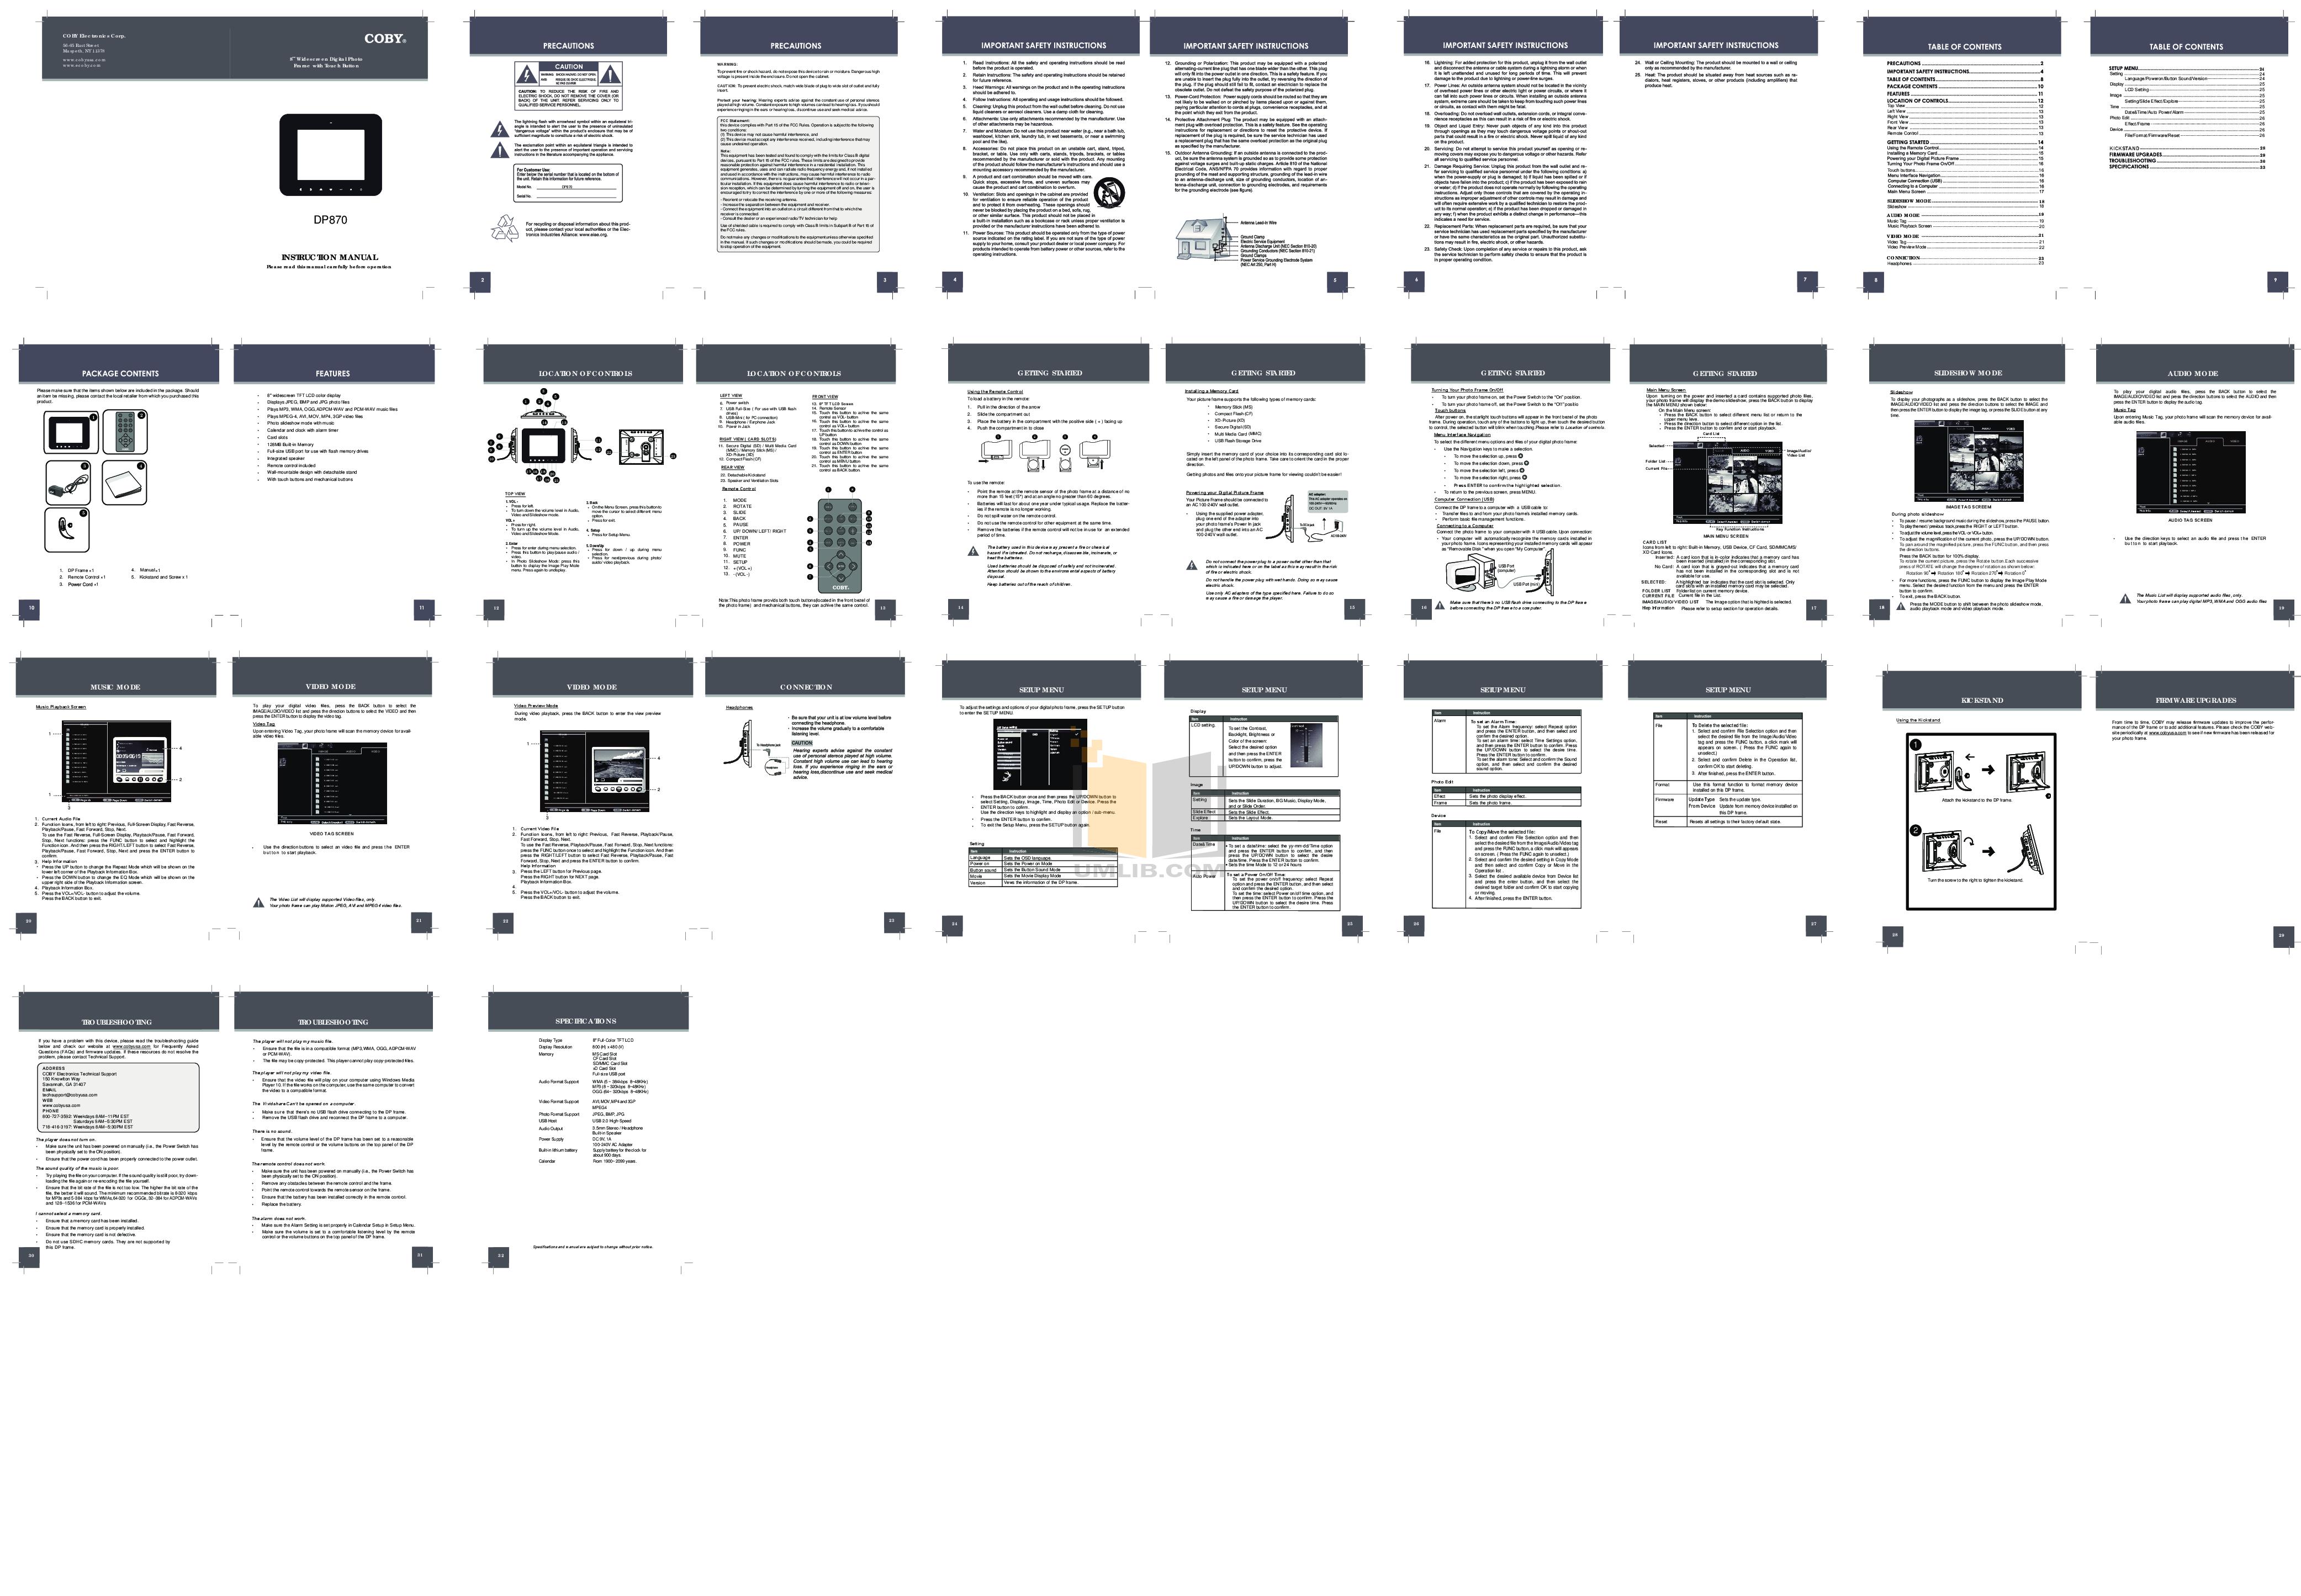 download free pdf for coby dp870 digital photo frame manual rh umlib com Clip Art User Guide User Training